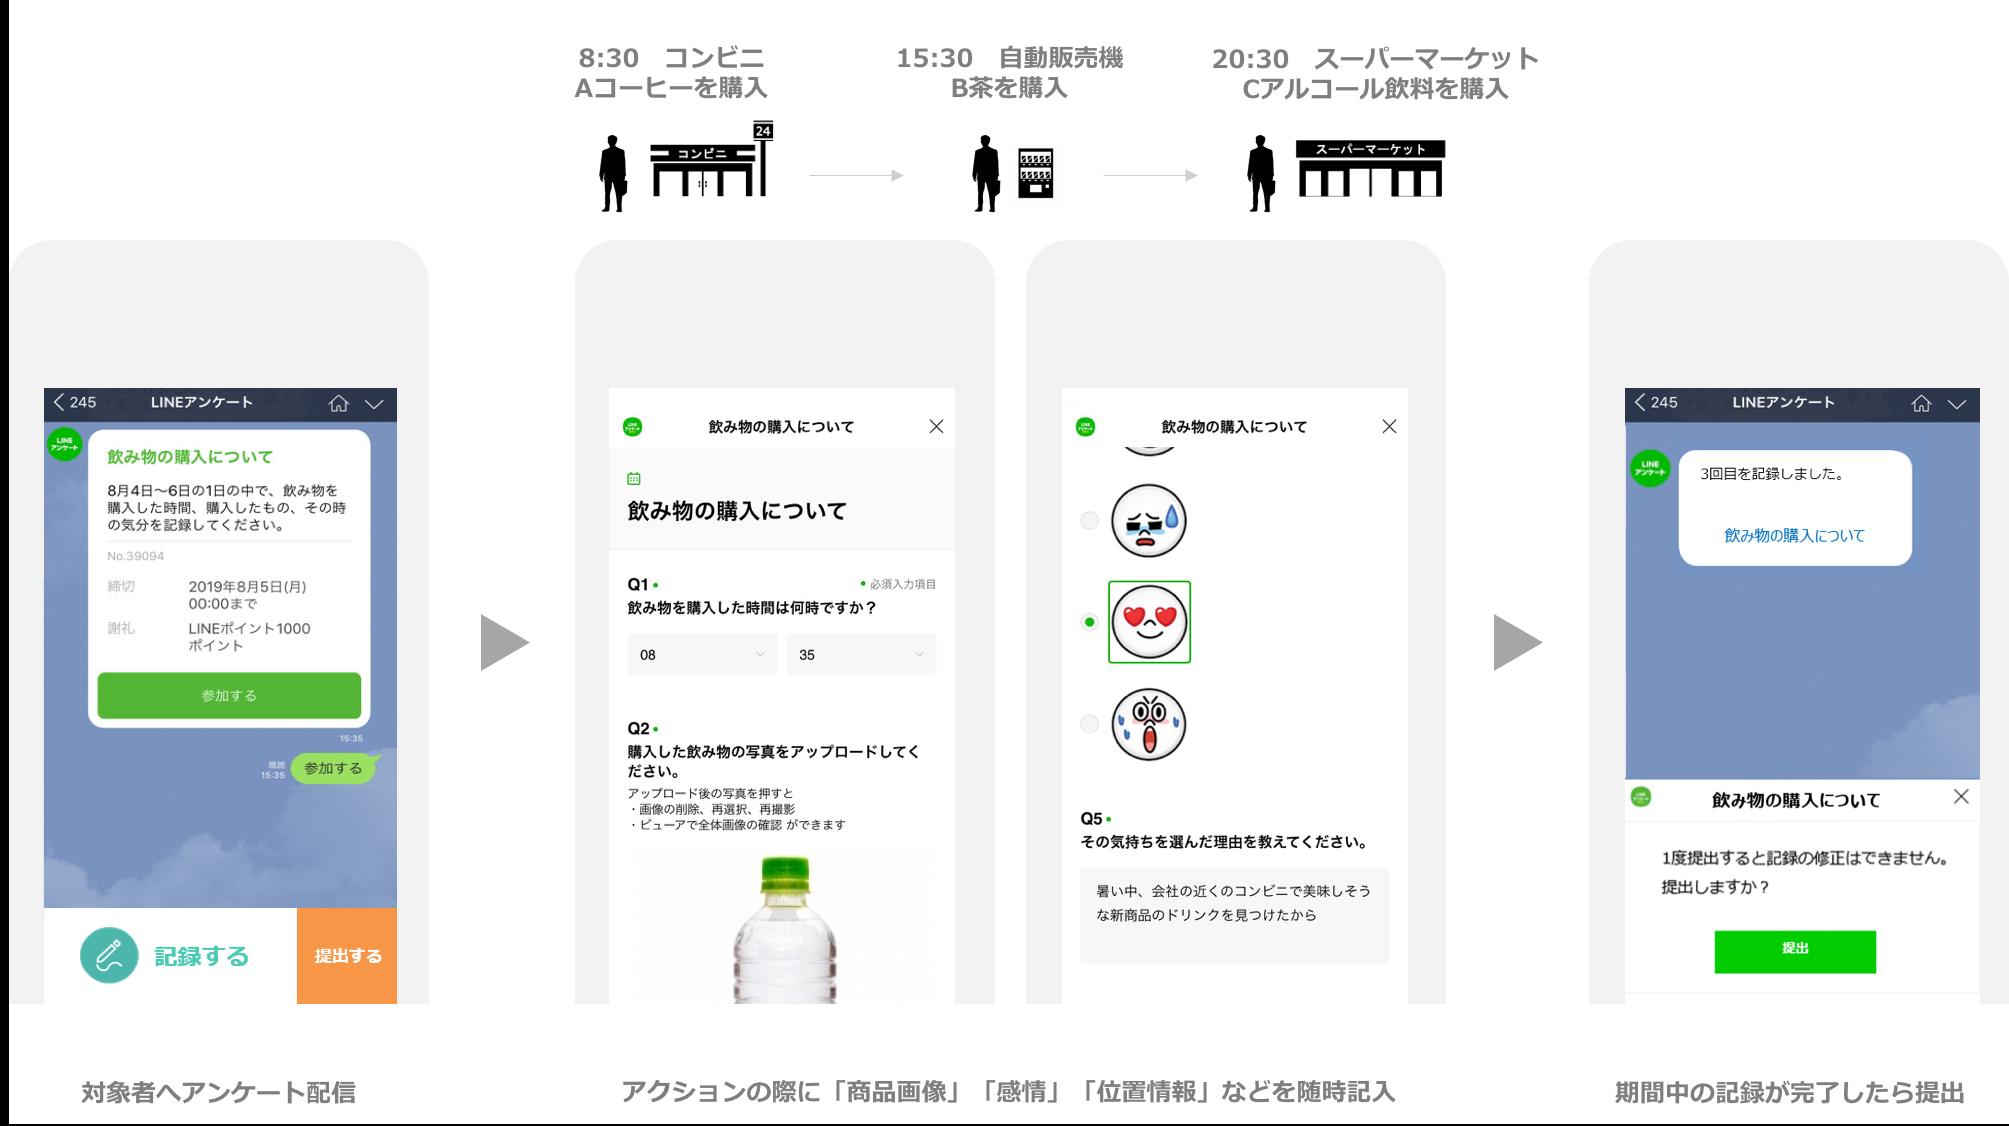 LINE 新機能「行動ログ調査」で顧客ロイヤリティ向上支援